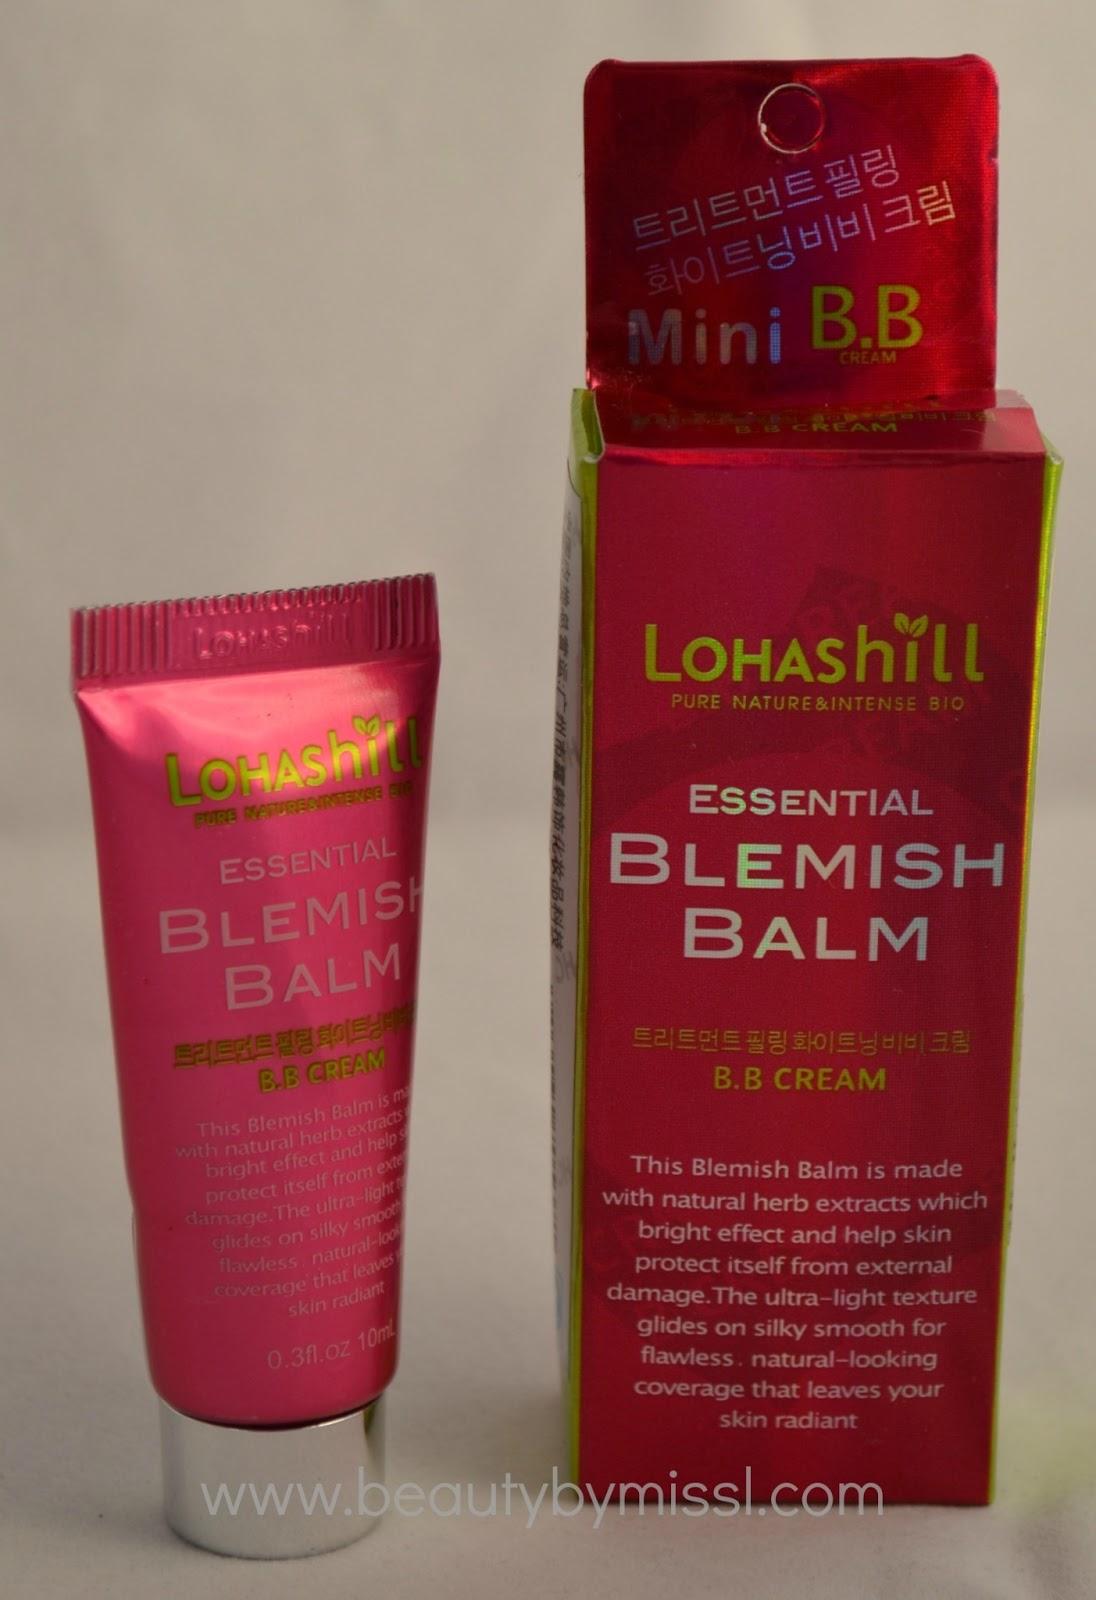 asian bb cream from born pretty store. Lohashill Red Lovers Essential Blemish Balm BB Cream